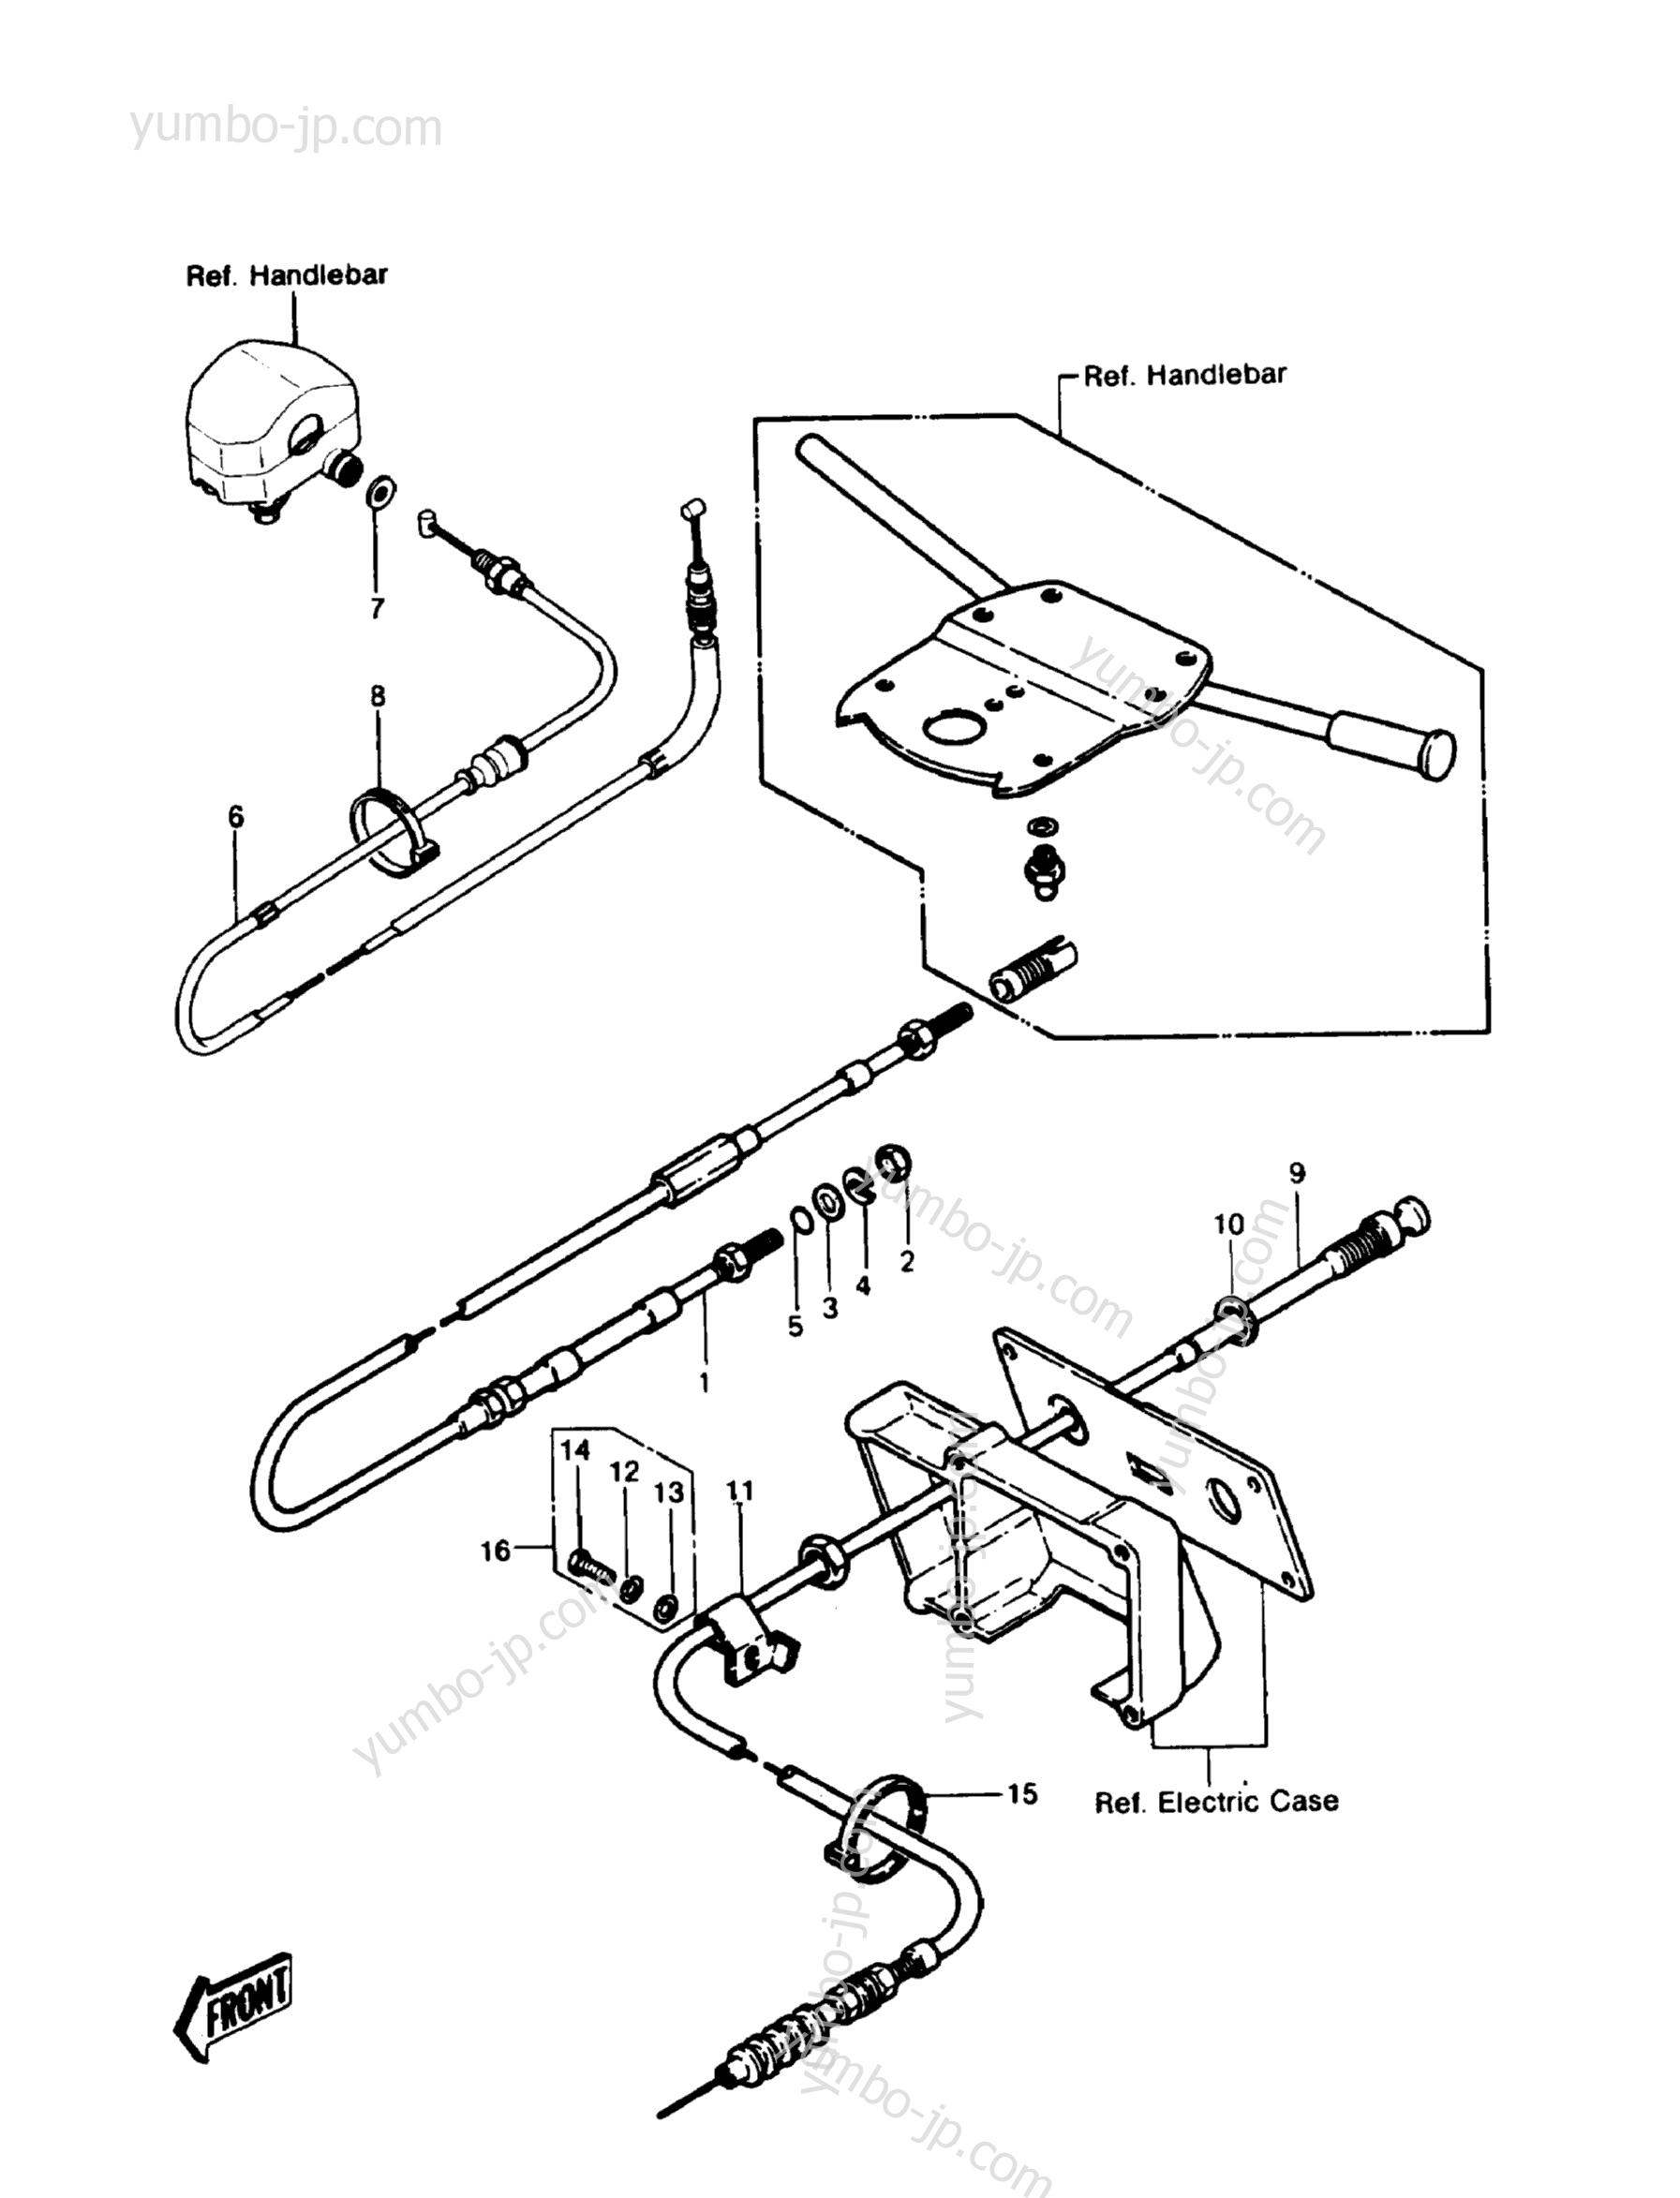 CABLES для гидроциклов KAWASAKI JST SKI 550 (JS550-A6) 1987 г.